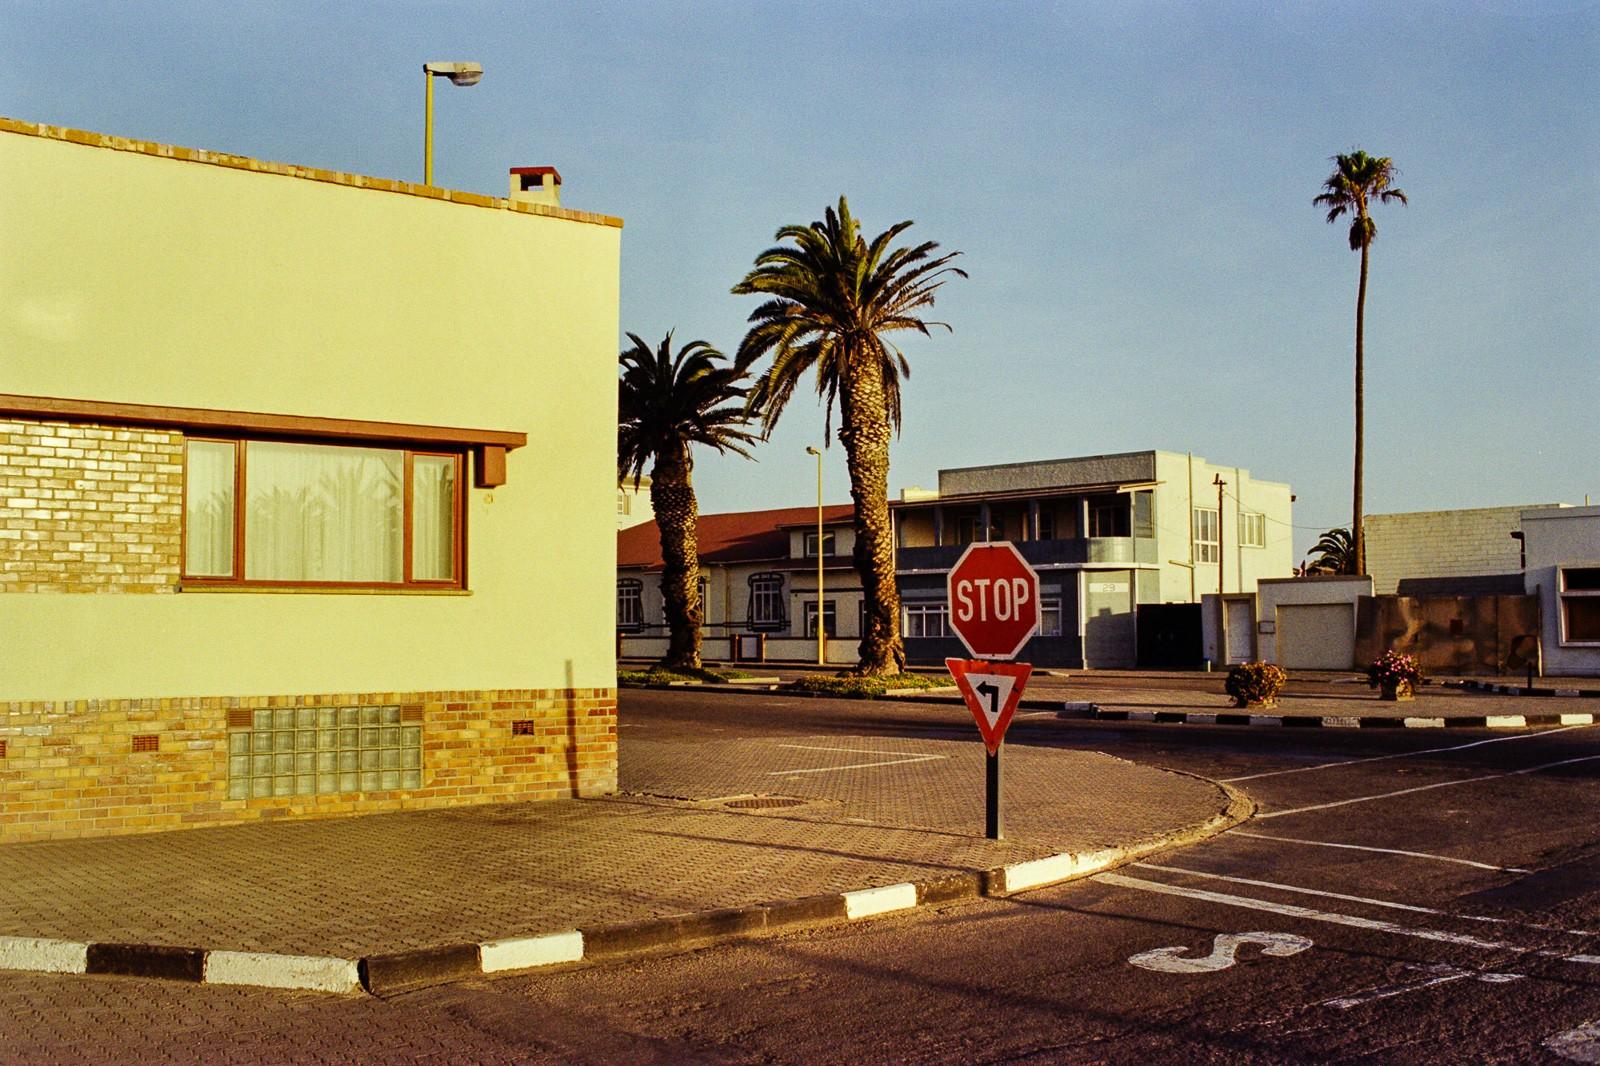 swakobmund namibia city portrait stop sign